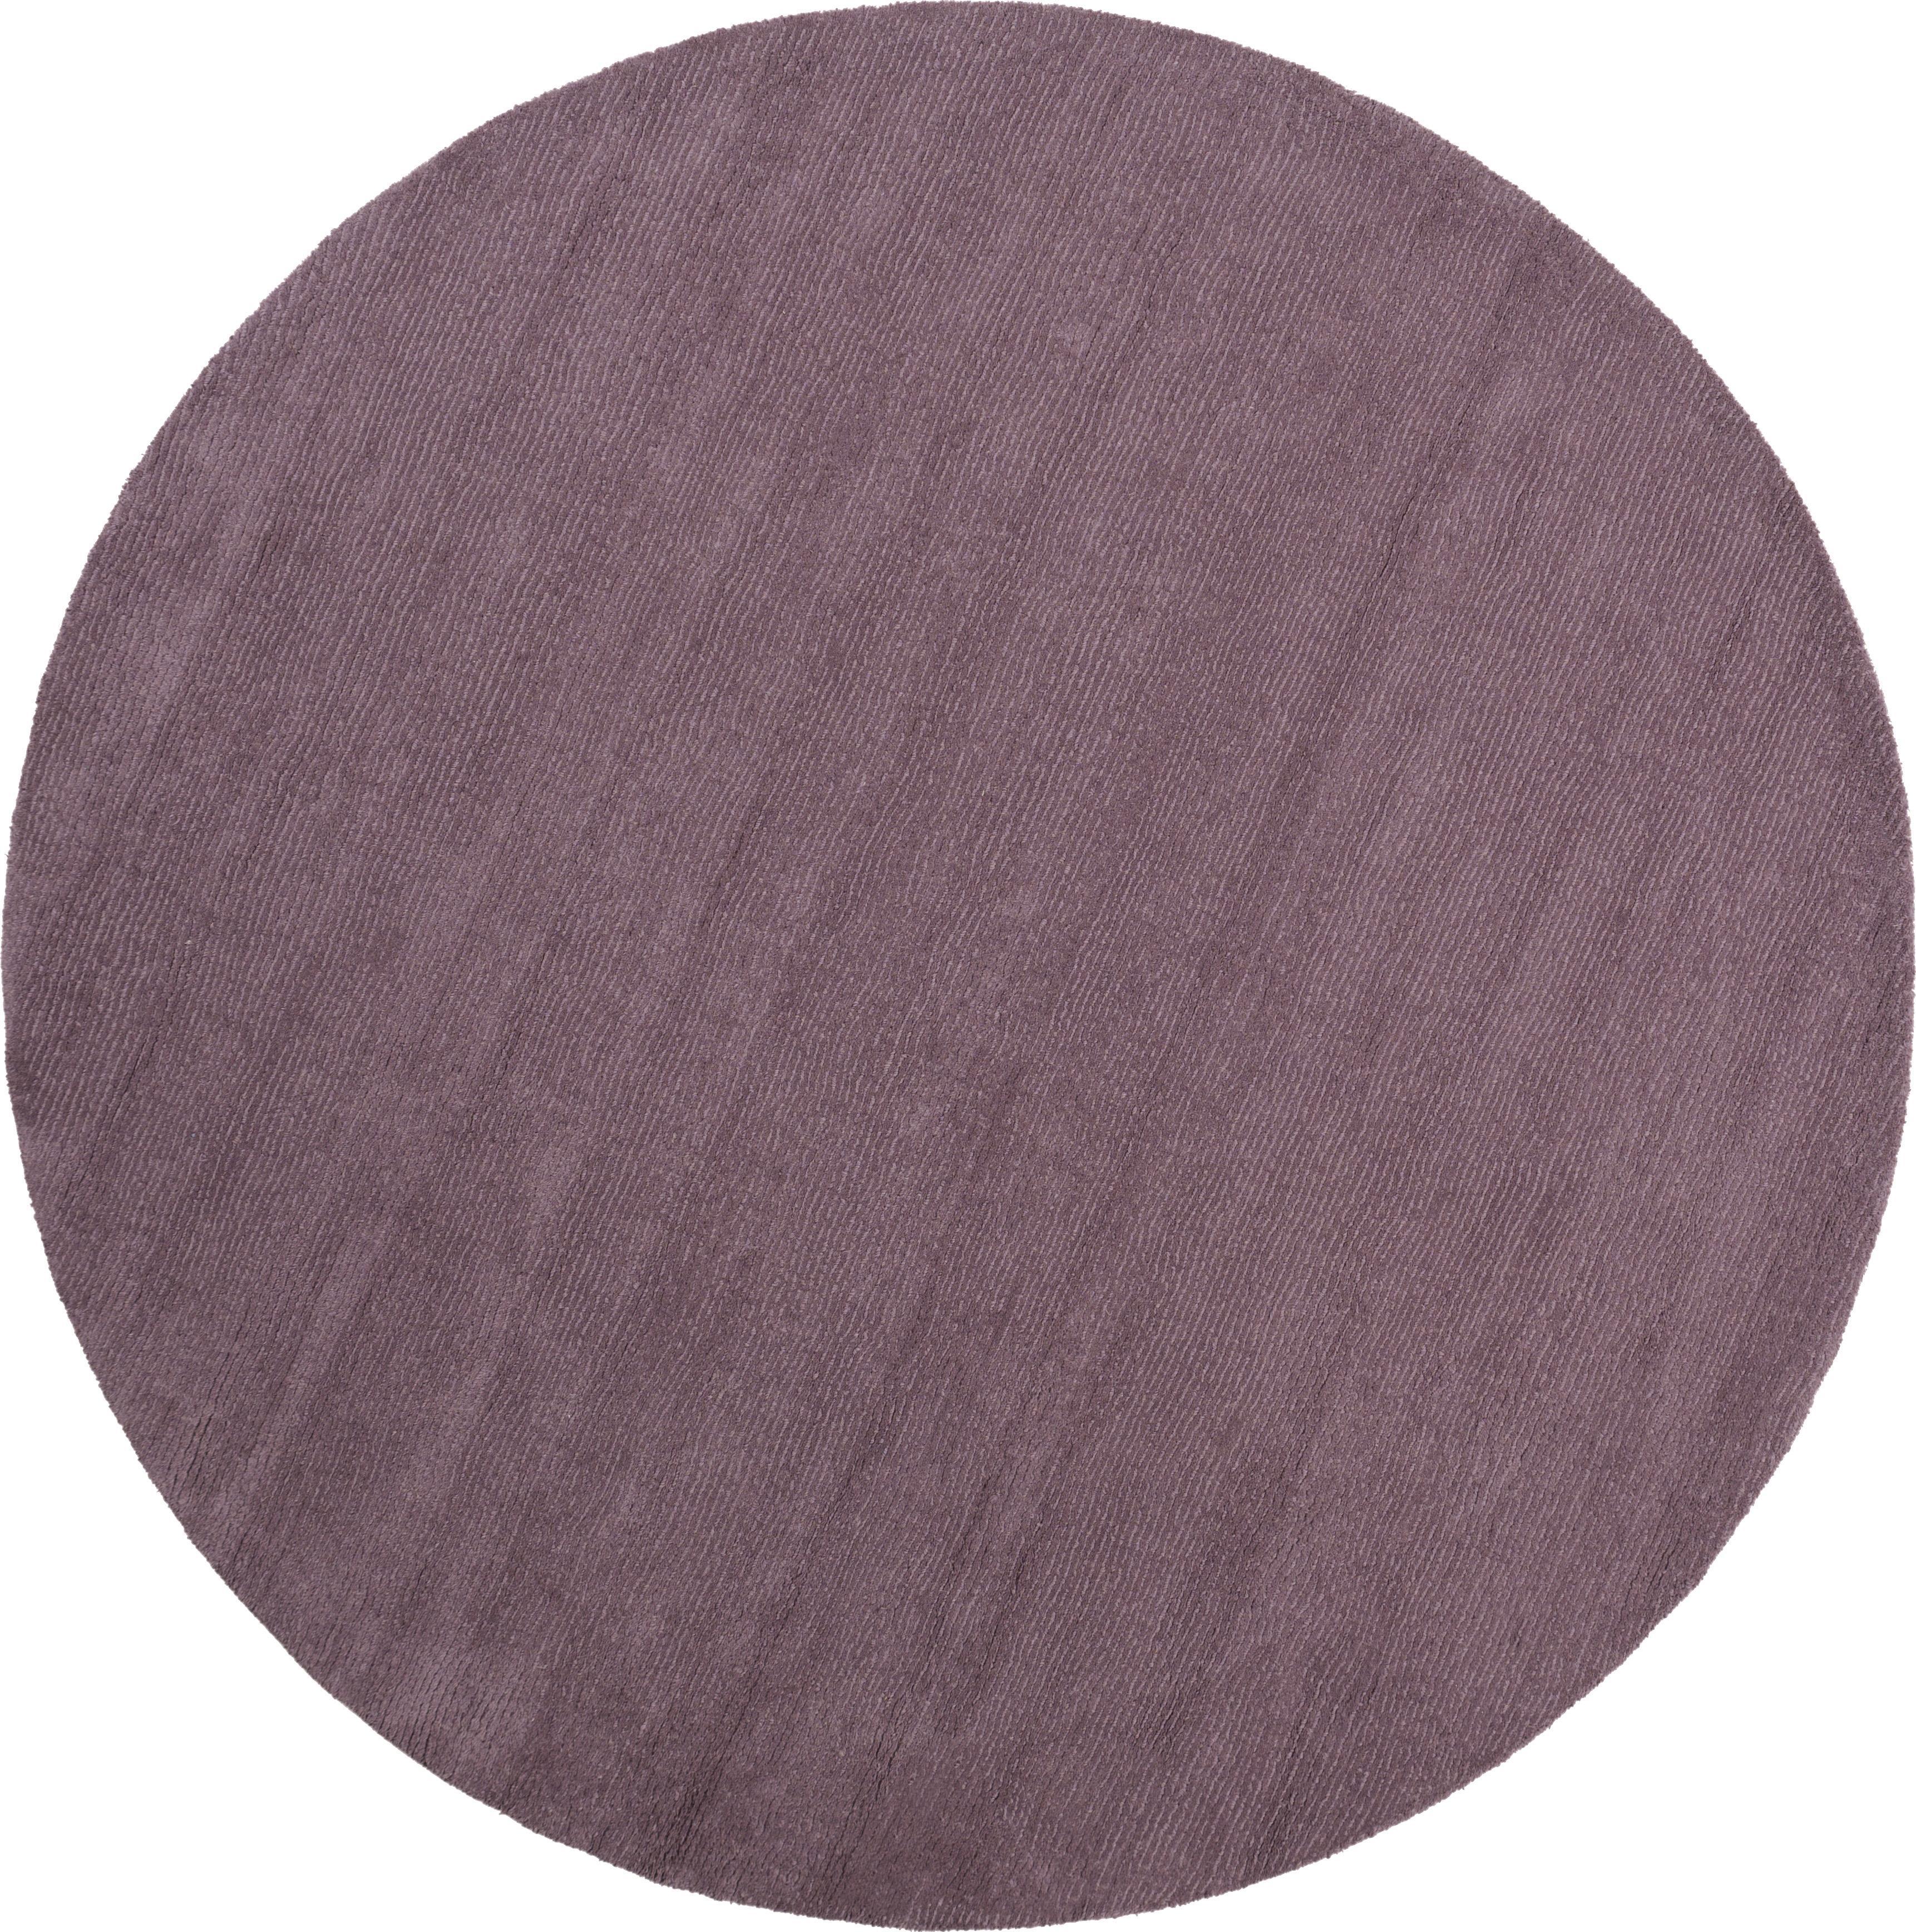 Surya Rugs Mystique 6' Round - Item Number: M5329-6RD